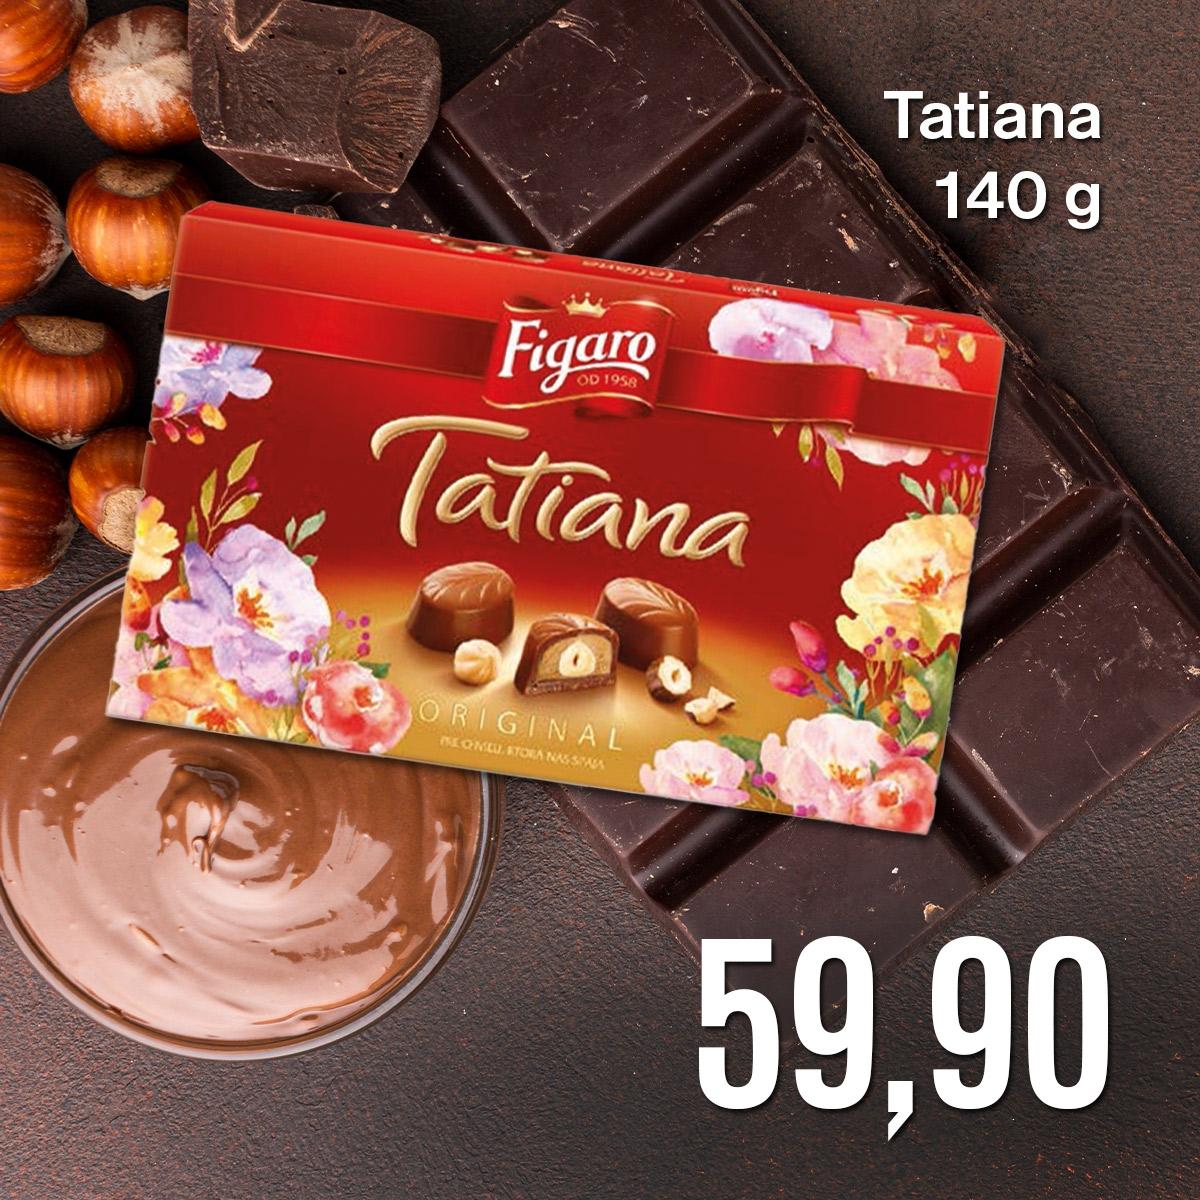 Tatiana 140 g